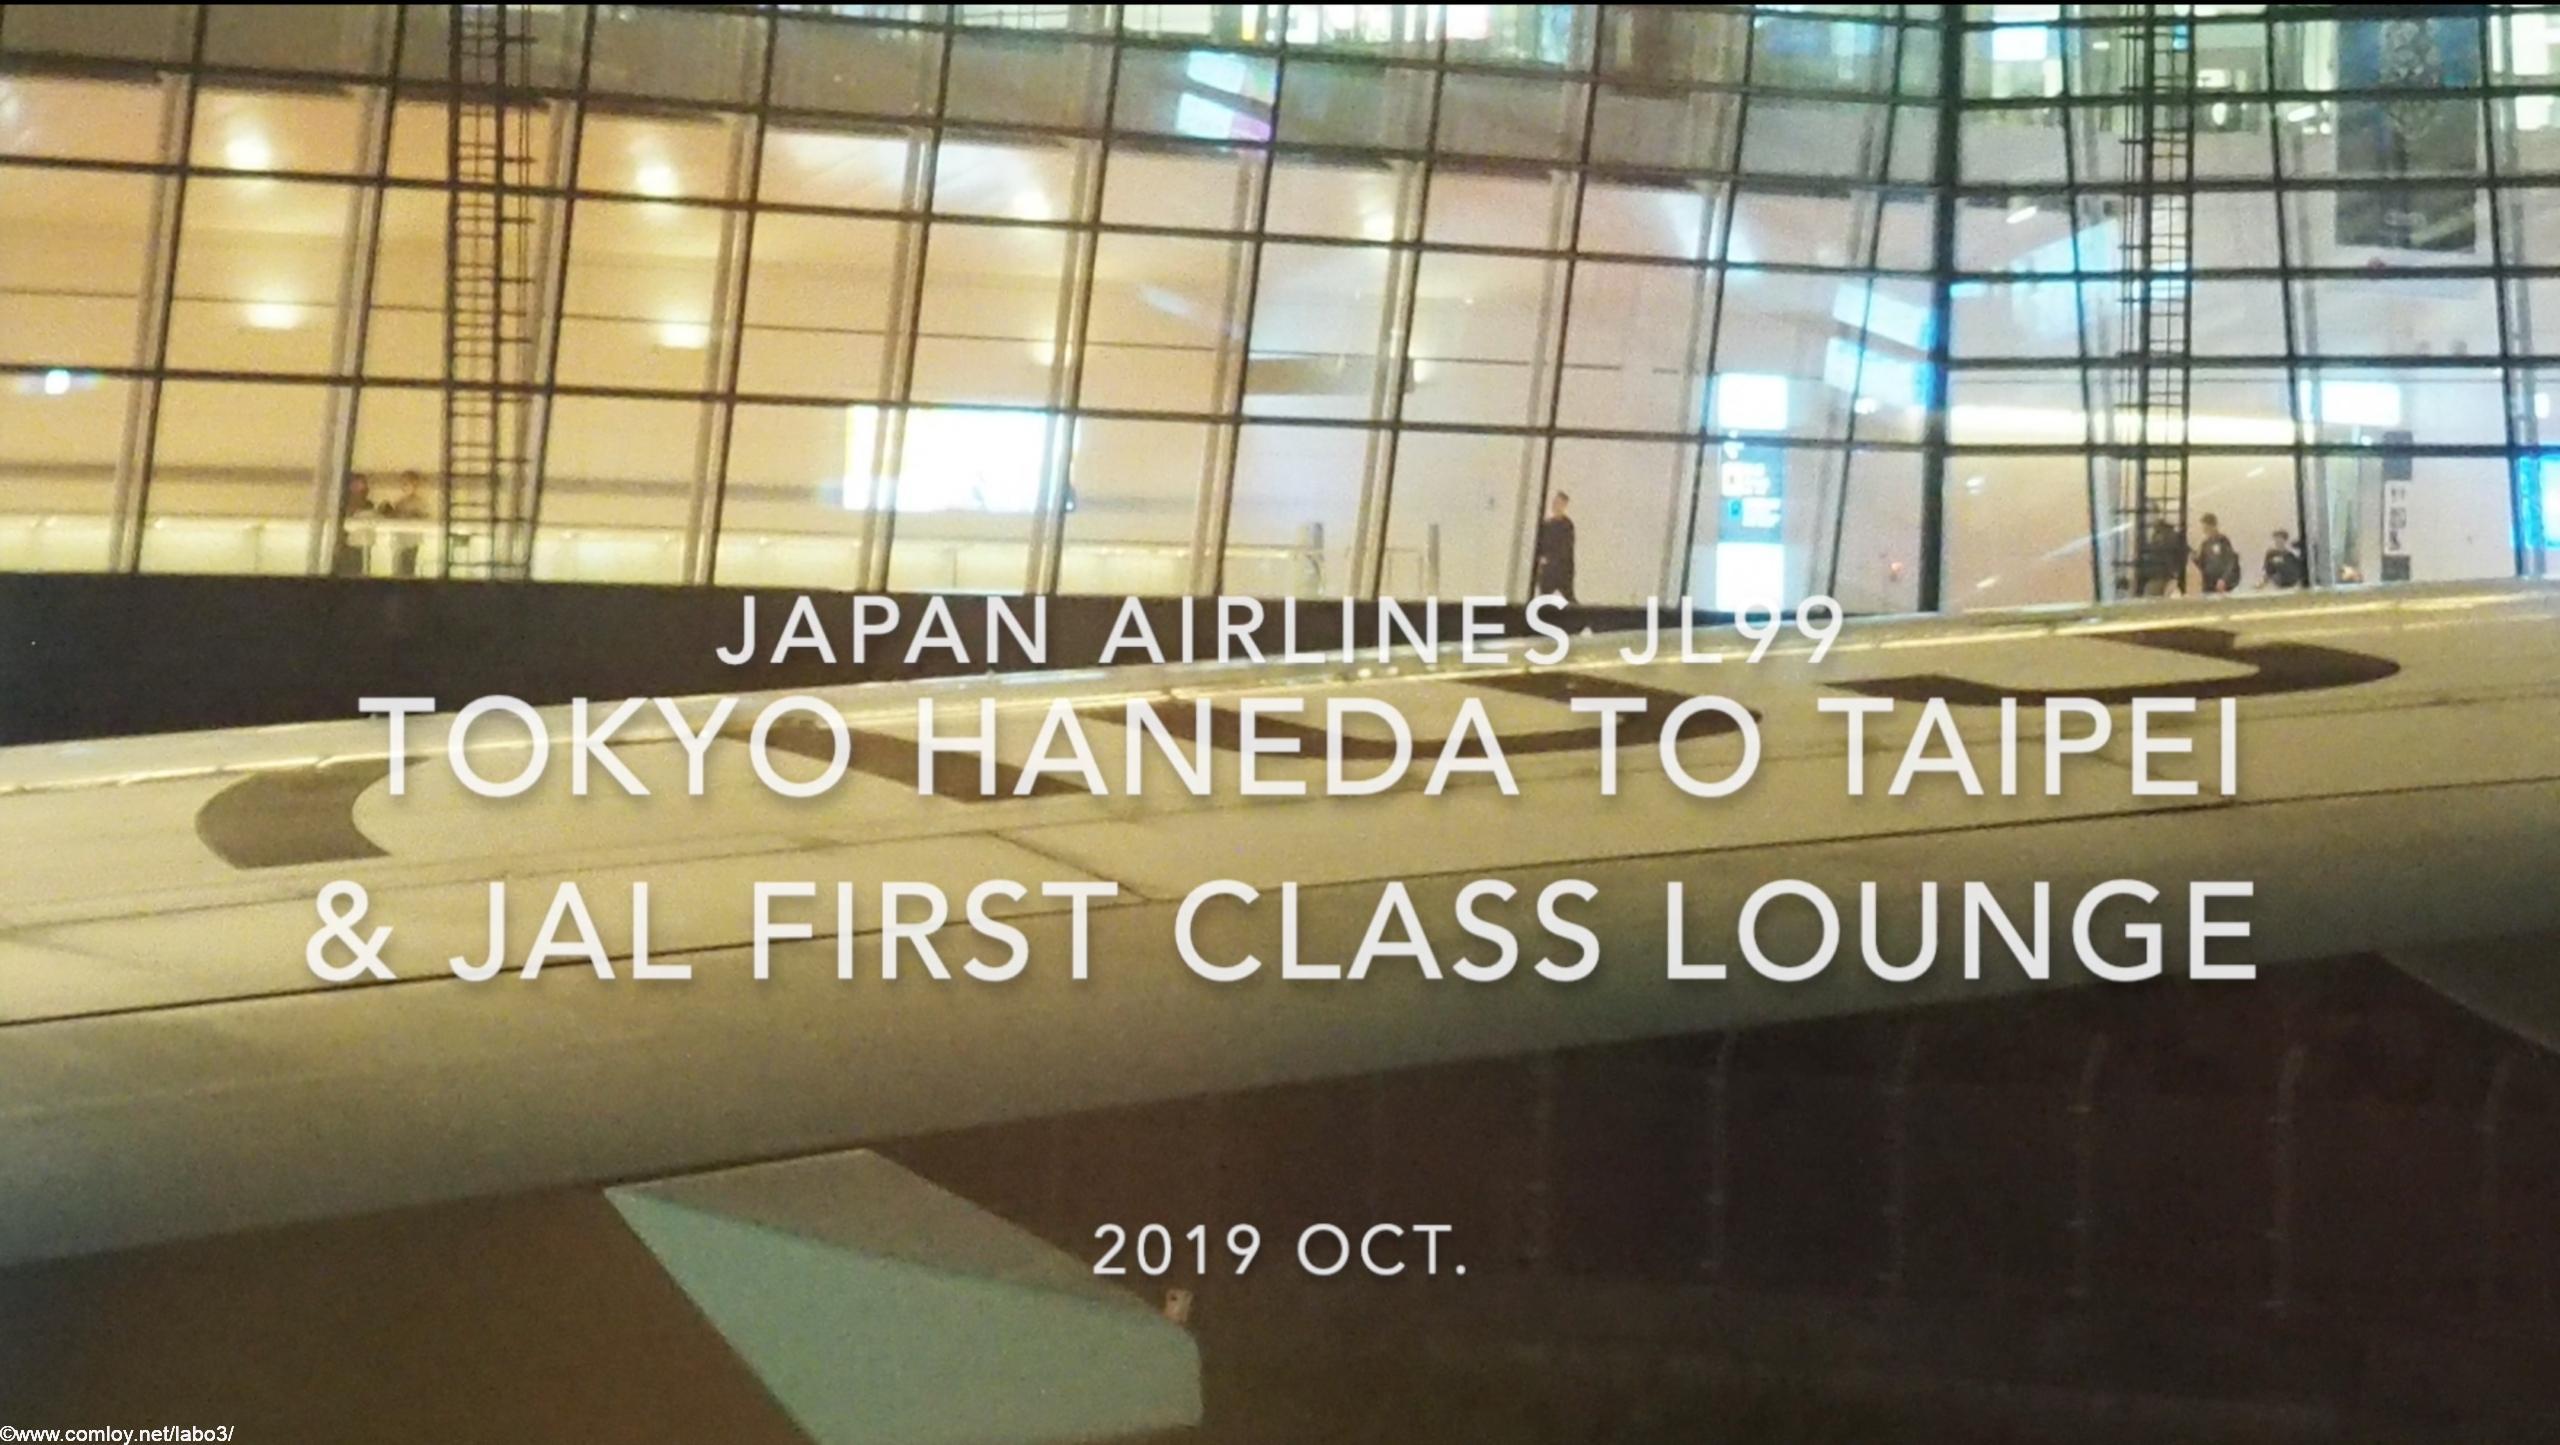 【Flight Report】2019 Oct Japan airlines JL99 TOKYO HANEDA TO TAIPEI 日本航空 羽田 - 台北(松山) 搭乗記